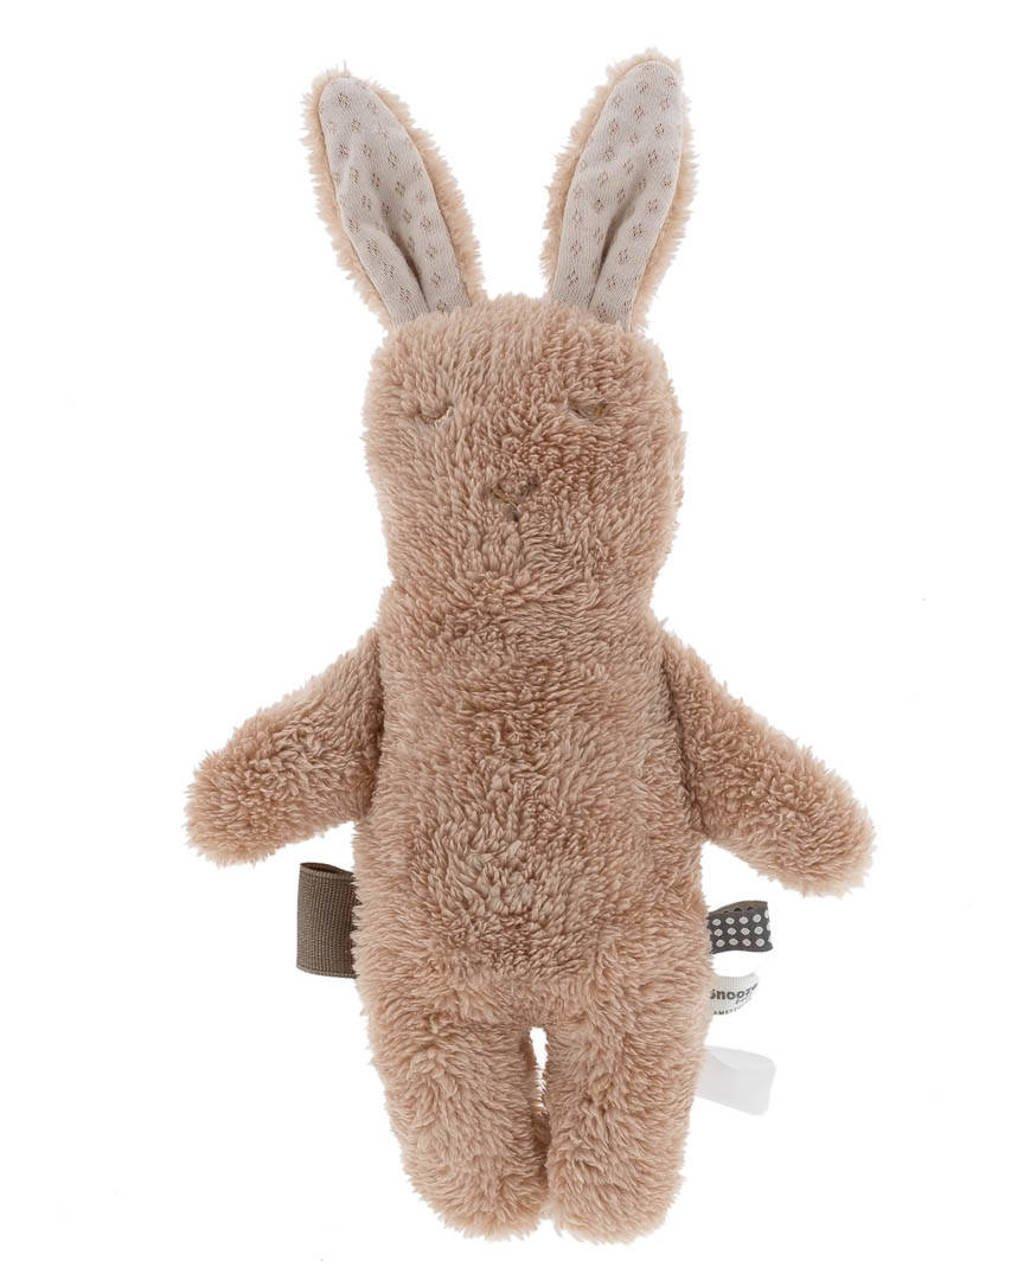 Snoozebaby konijn knuffel 30 cm, Roest